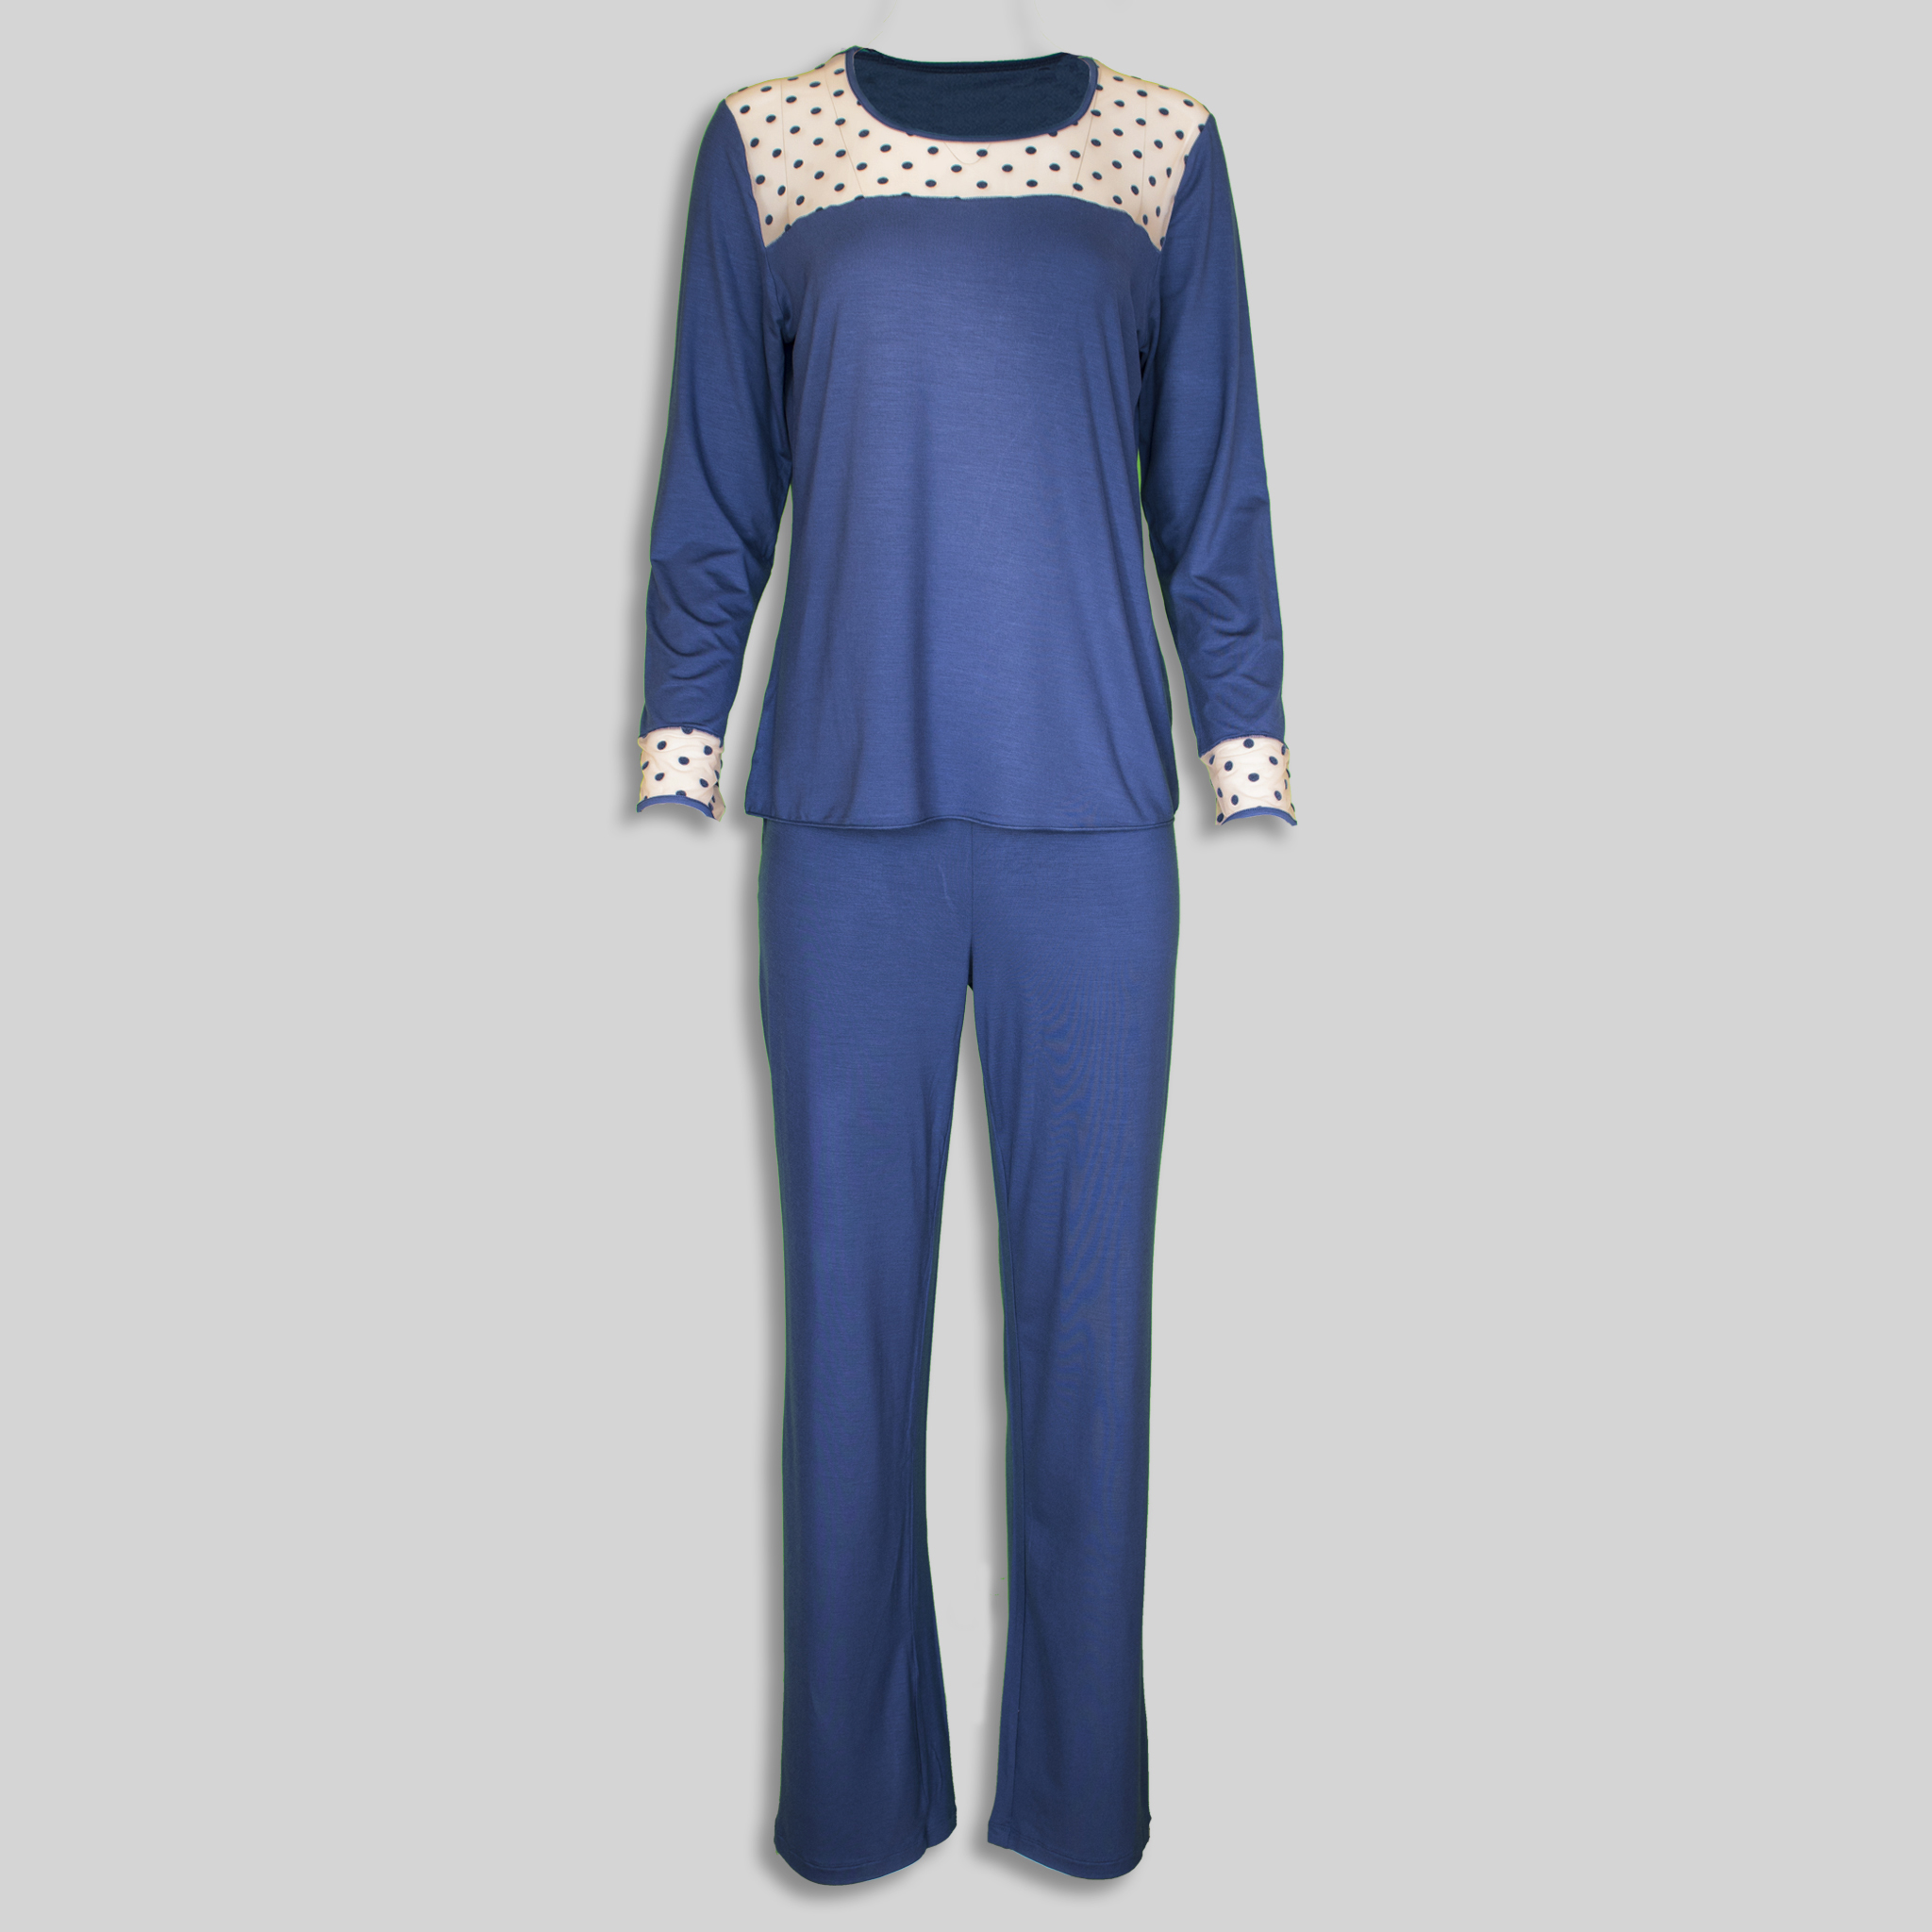 "Ladies Pajama ""Infinity Polka Dots"""